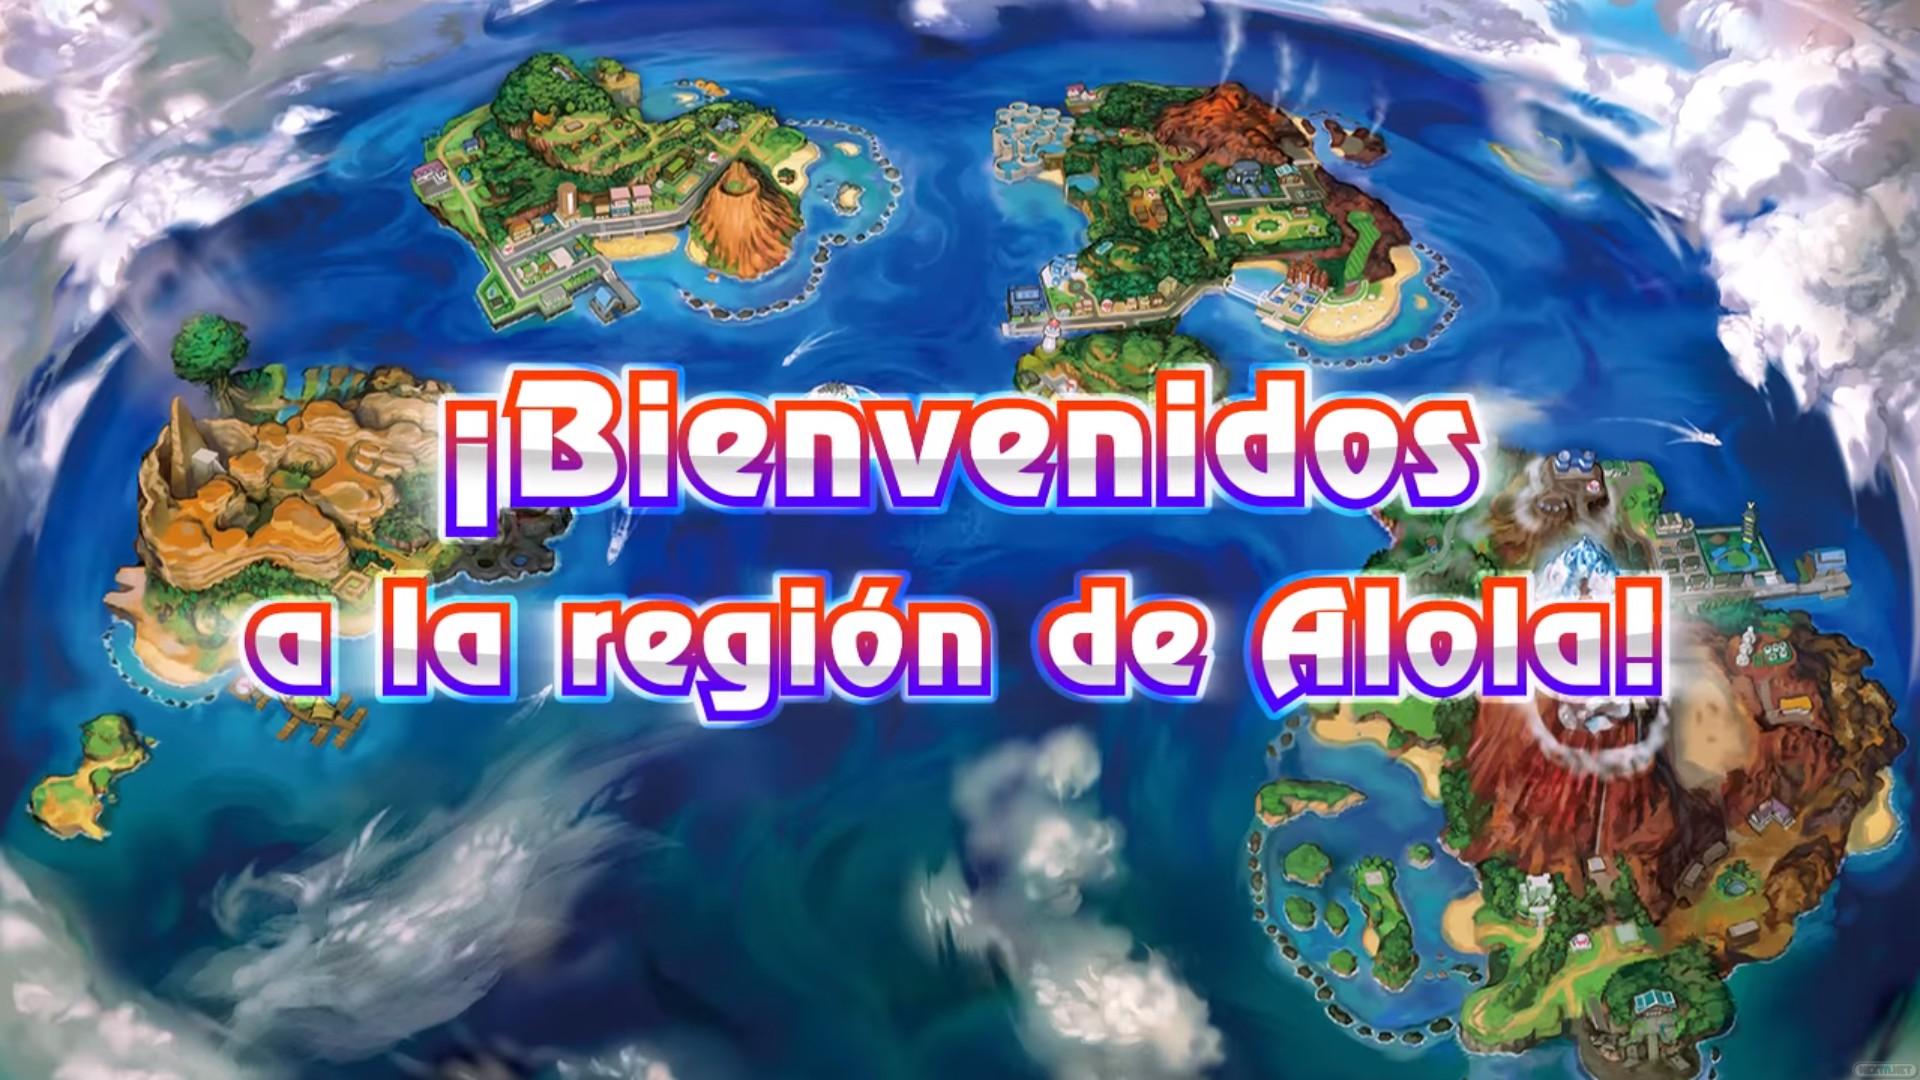 1606-02 Pokémon Sol Y Luna10 - Pokemon Sun And Moon World , HD Wallpaper & Backgrounds